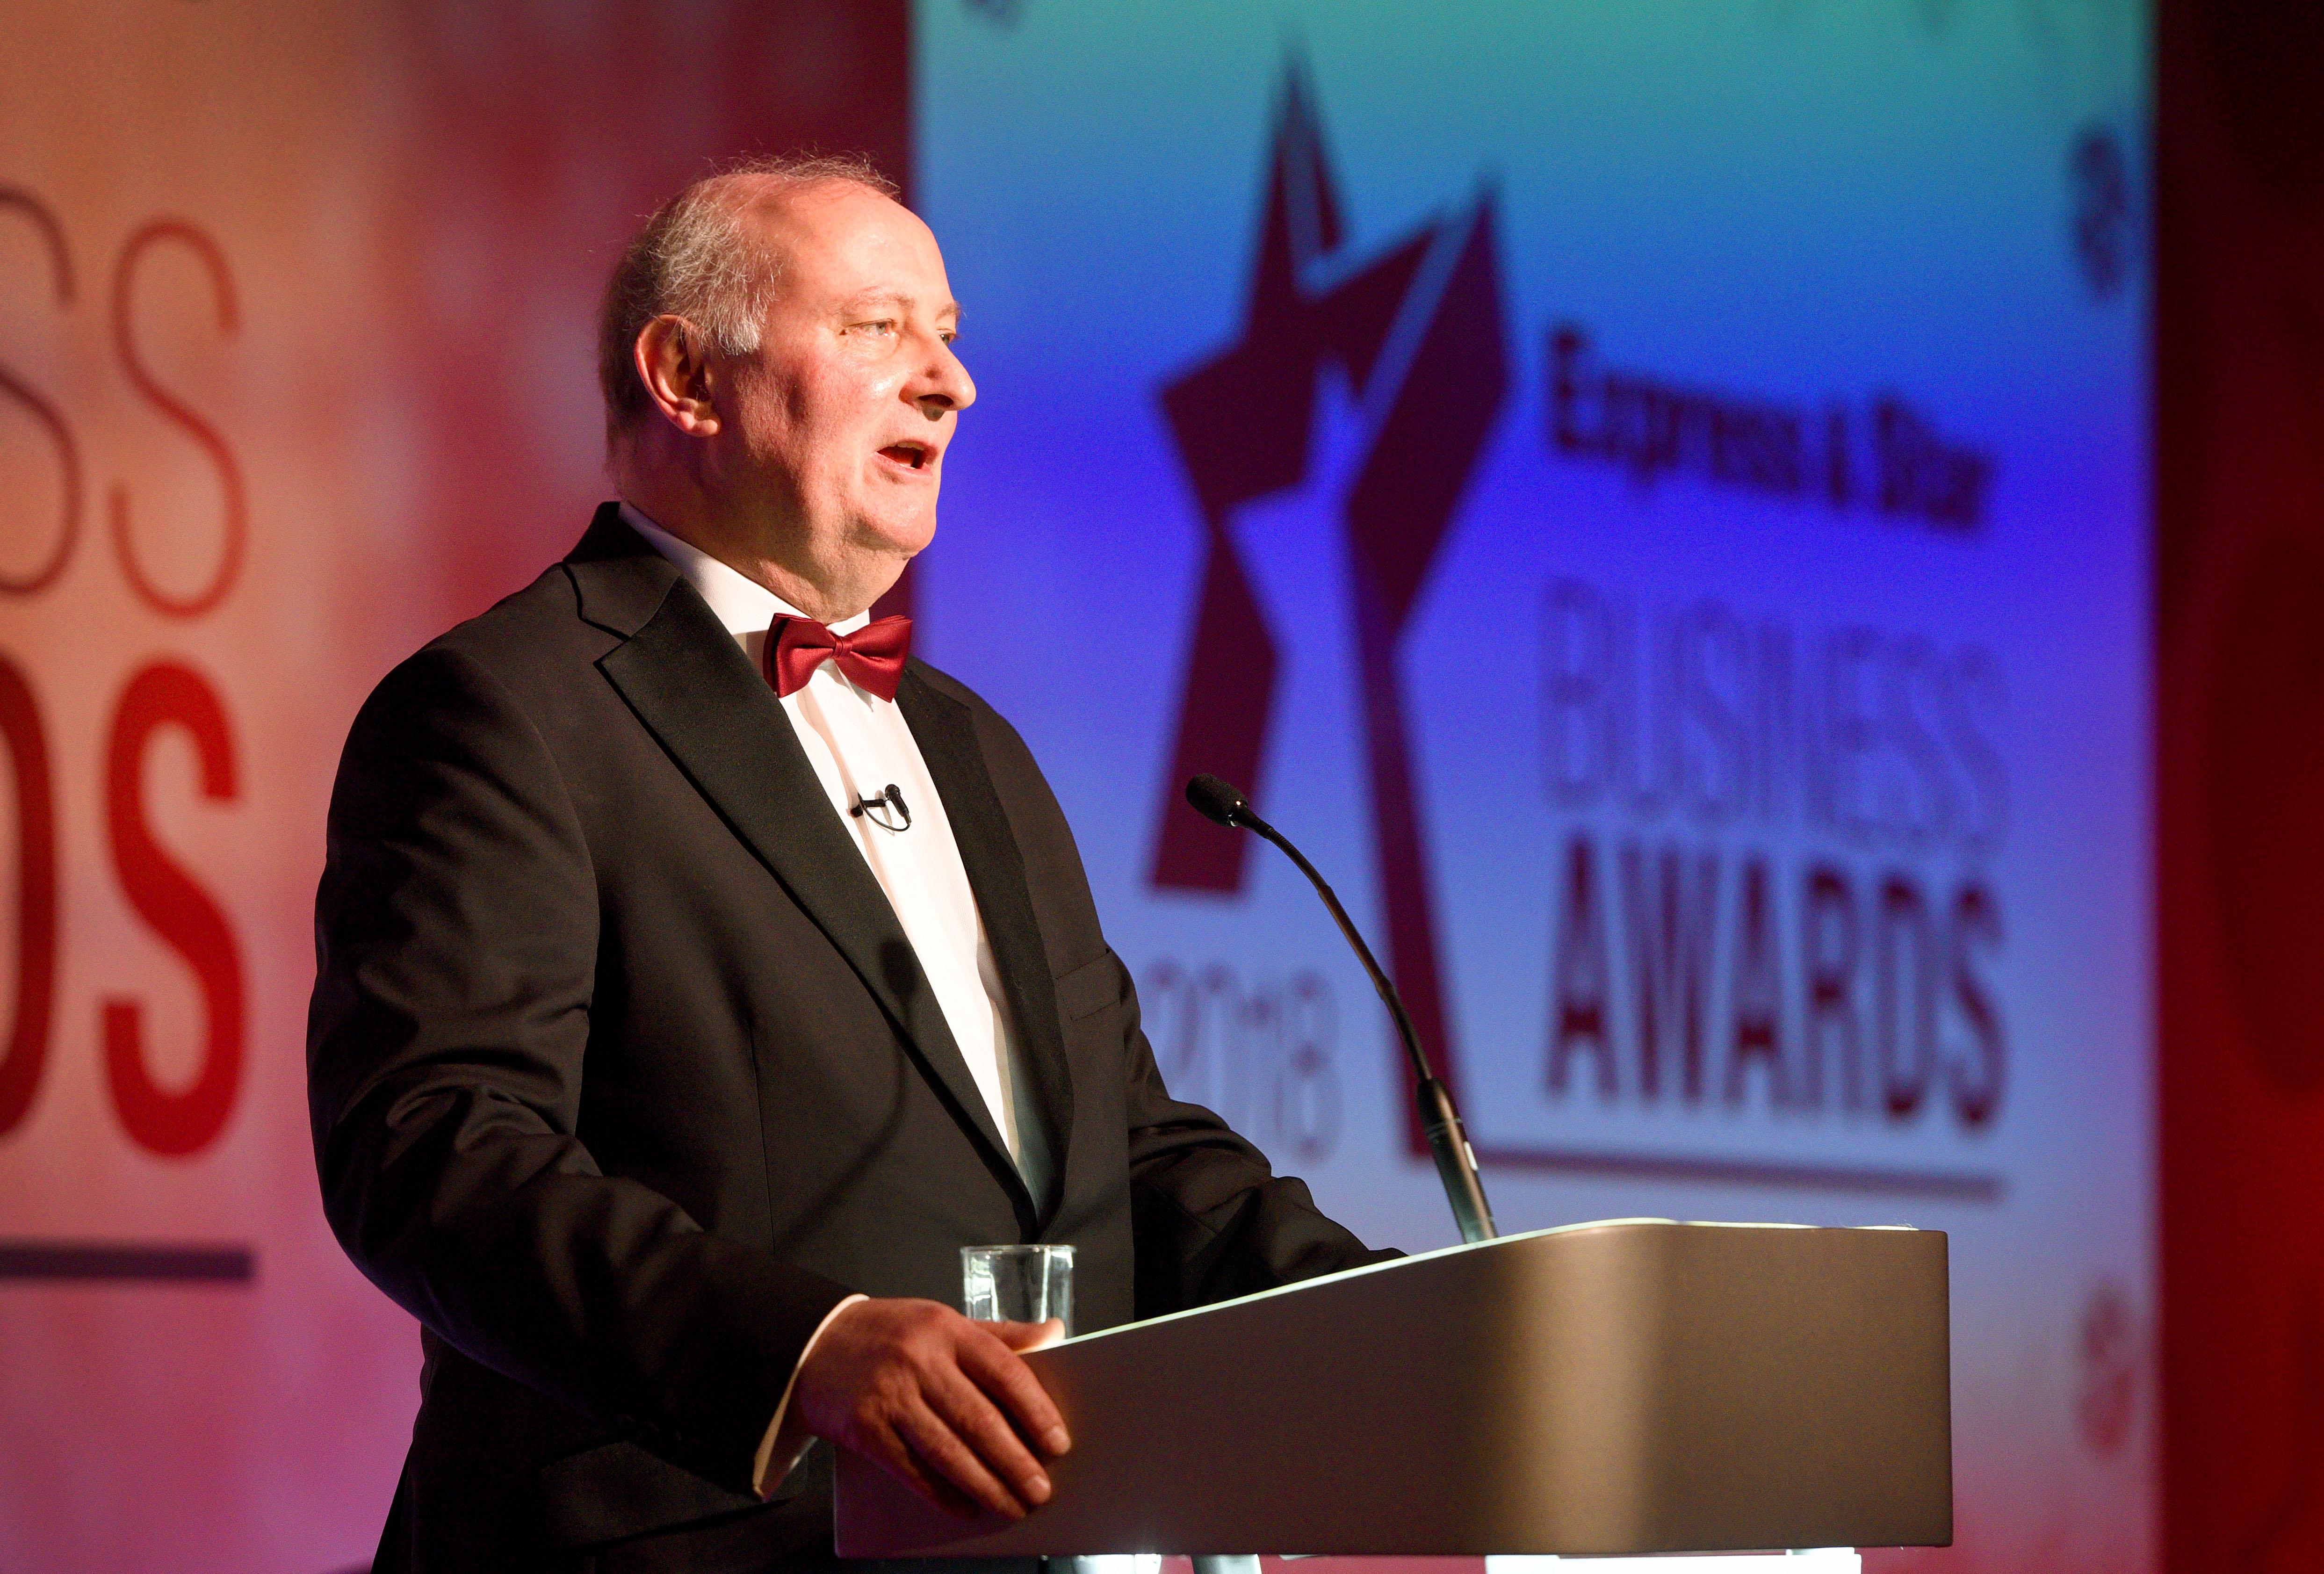 Business Awards Sponsor Star Employment enjoys busy Year - Star Employment